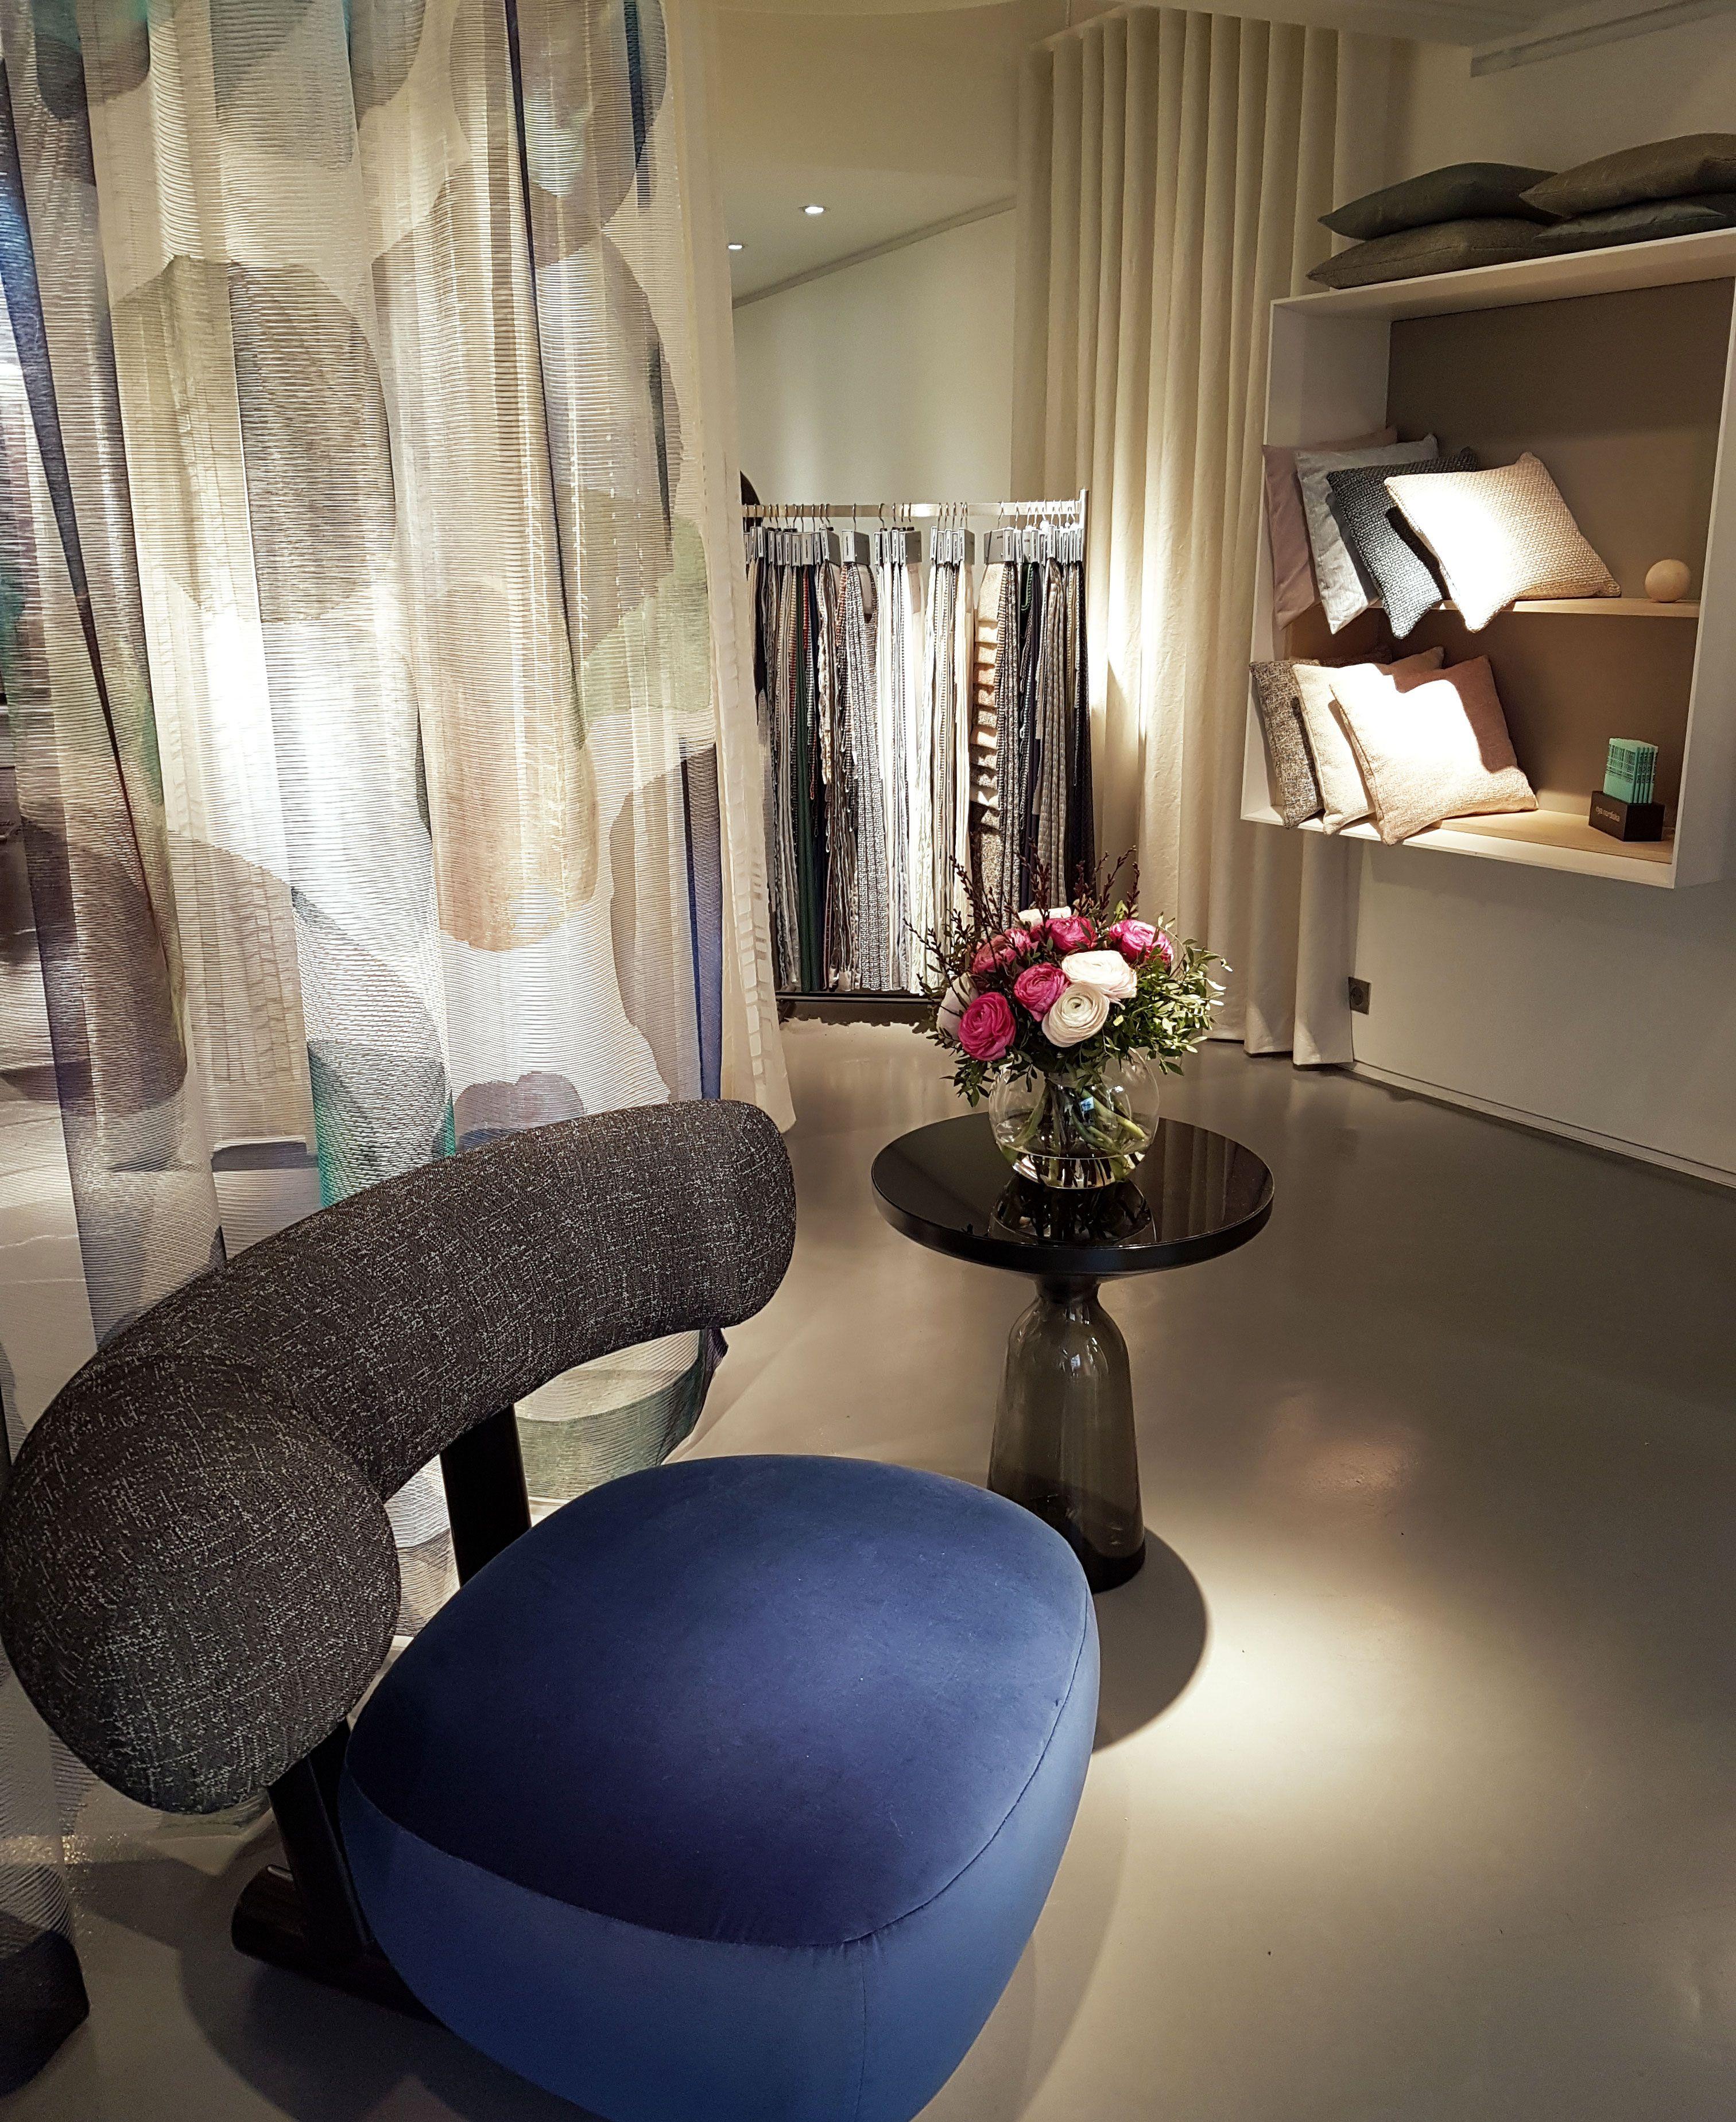 teppiche berlin free bernau with teppiche berlin iran kermam orient teppich x vasen teppich. Black Bedroom Furniture Sets. Home Design Ideas